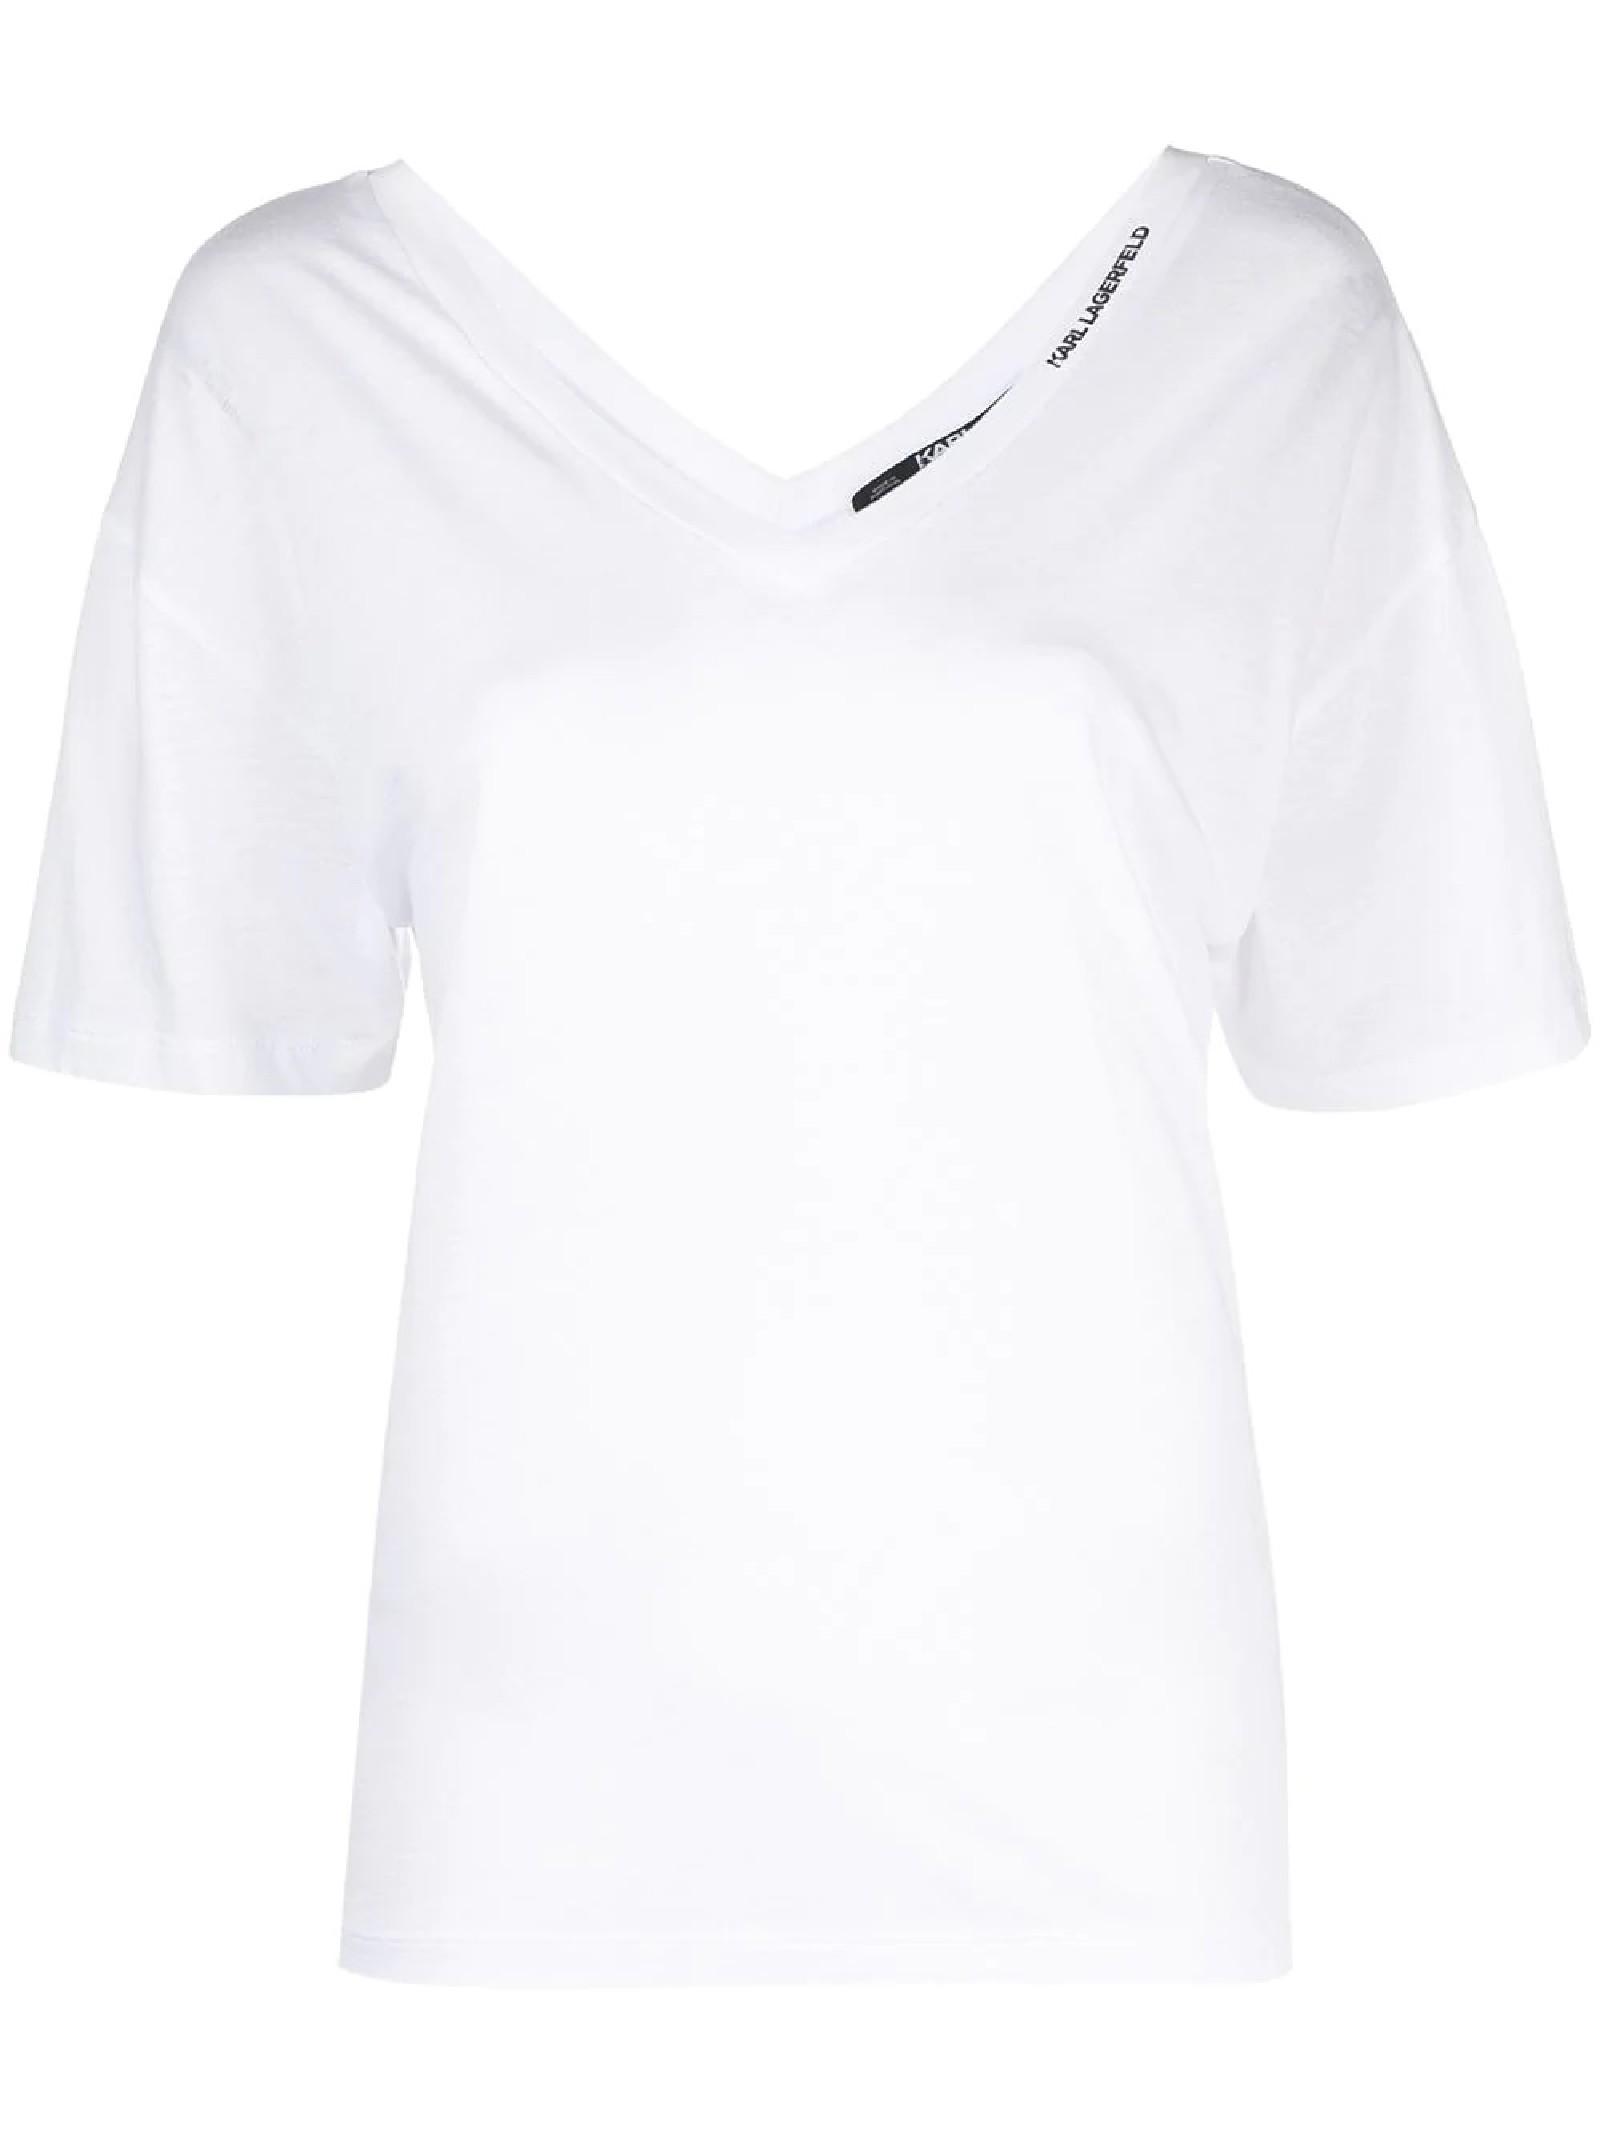 T-shirt bianca con scollo a V KARL LAGERFELD | T-shirt | 211W1701100